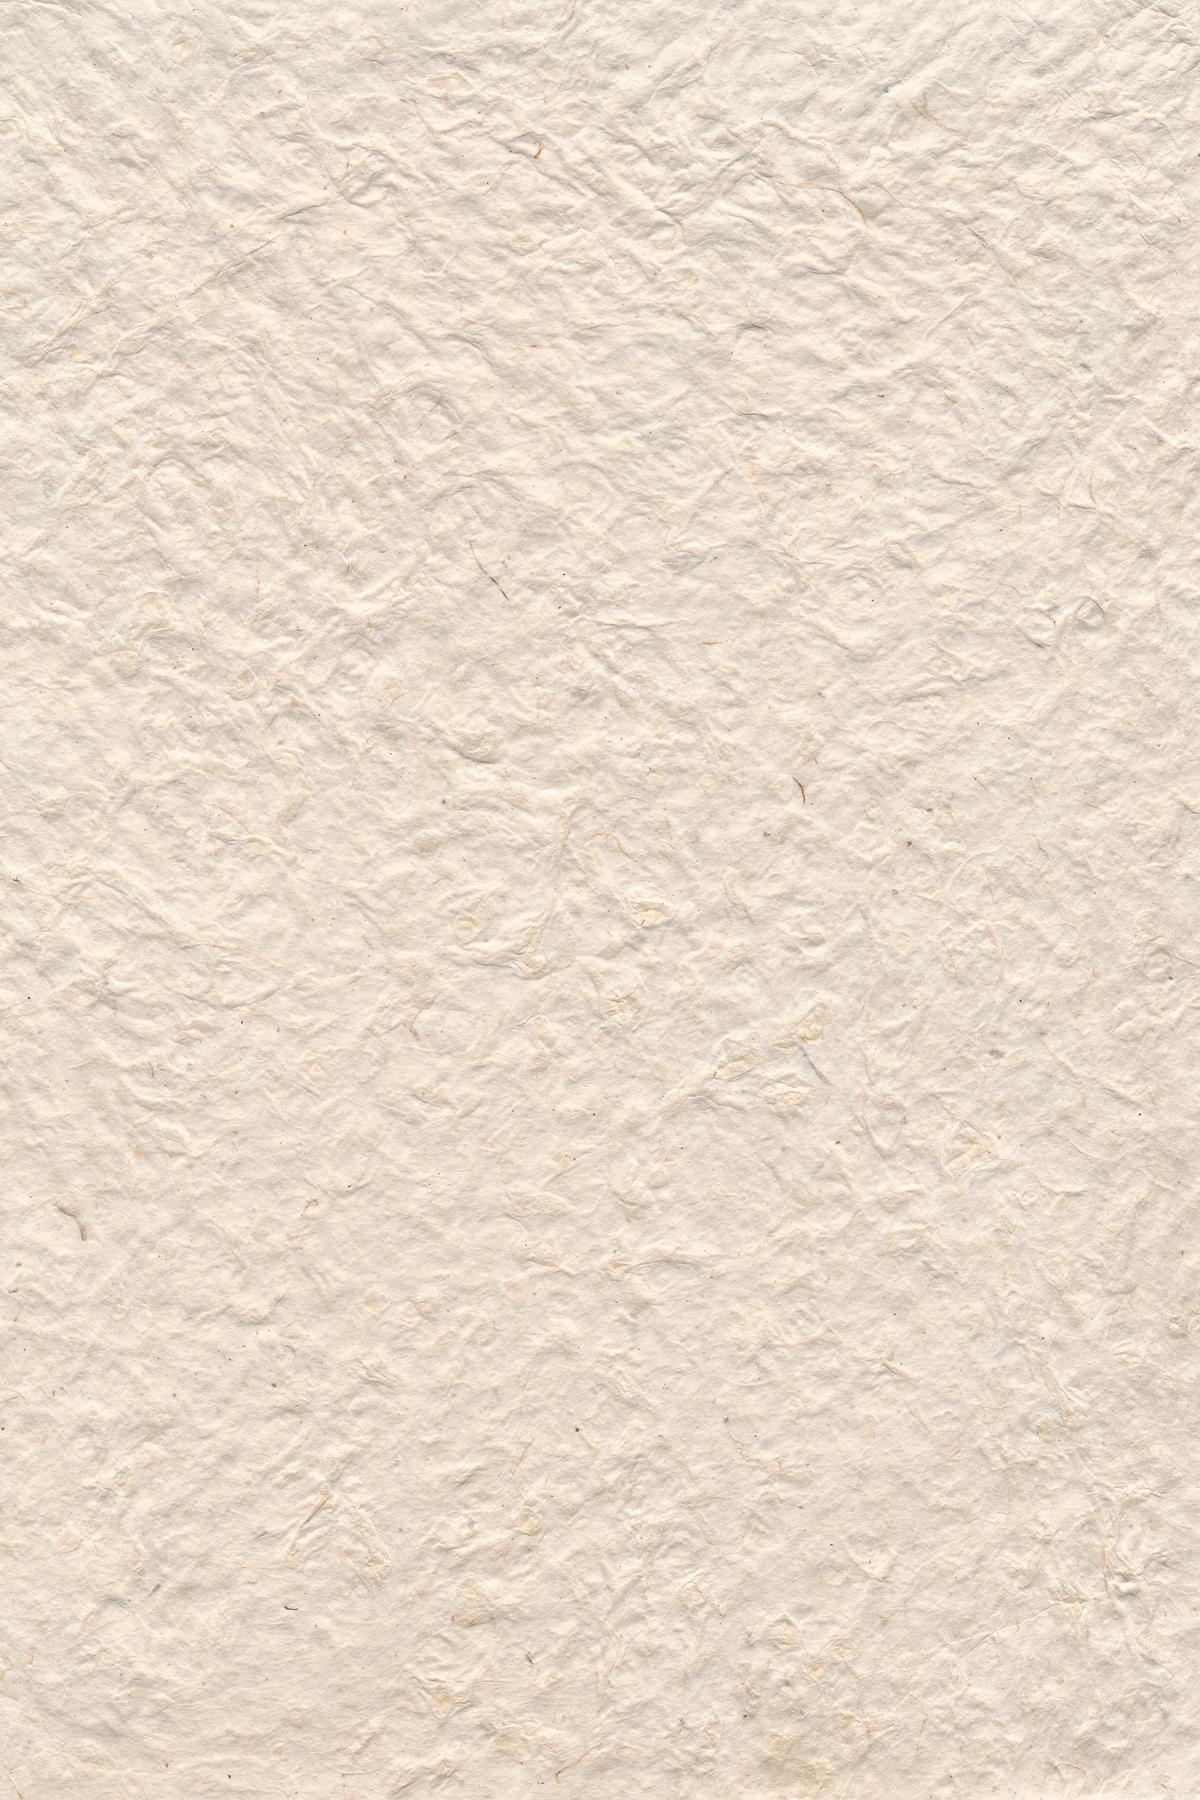 Blank Parchment Texture, Resource, Res, Scrap, Scrap-book, HQ Photo